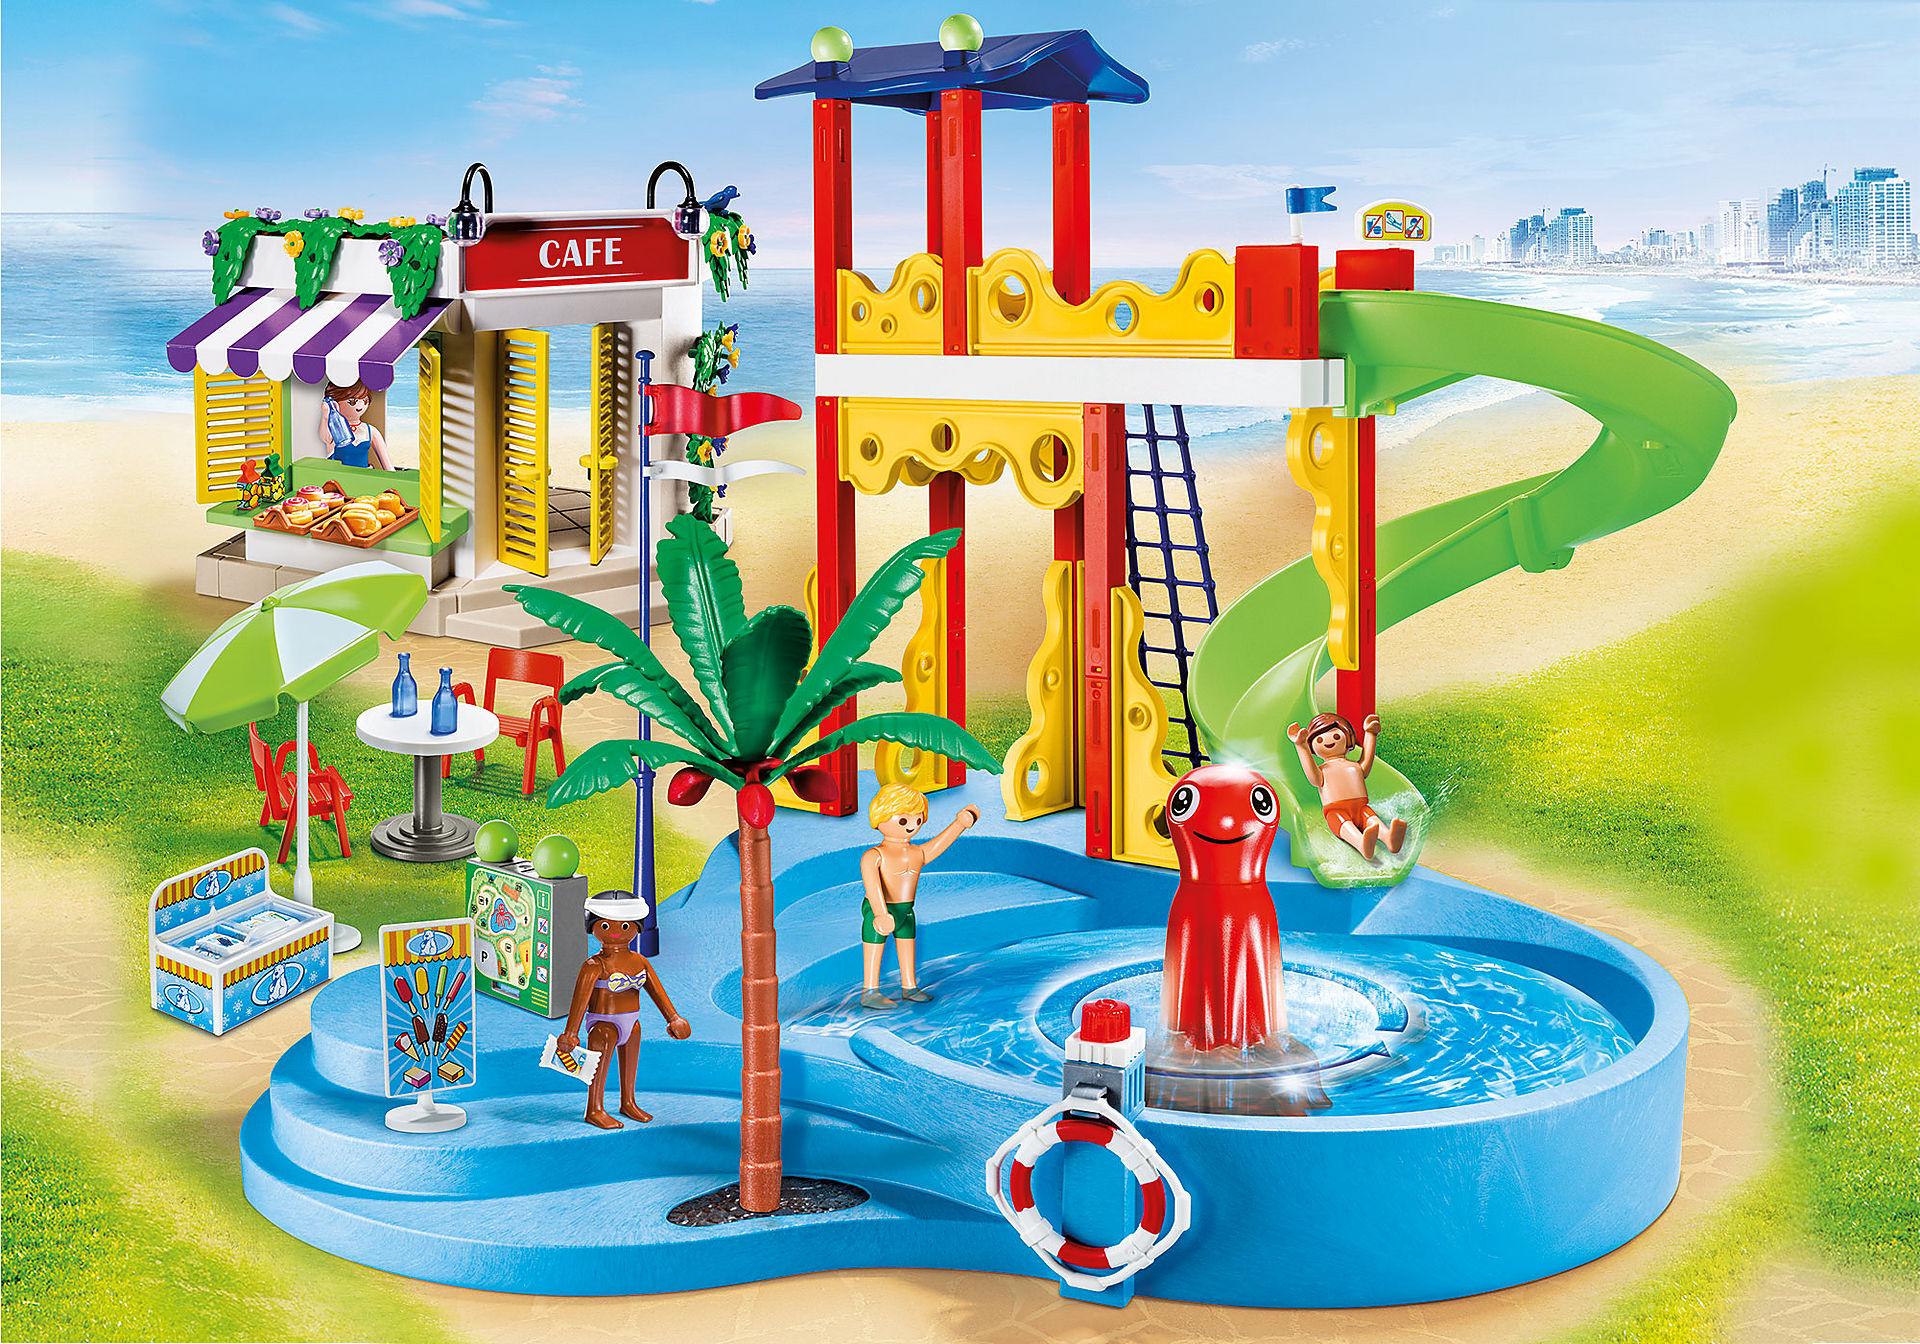 70115 Aquapark mit Café zoom image1